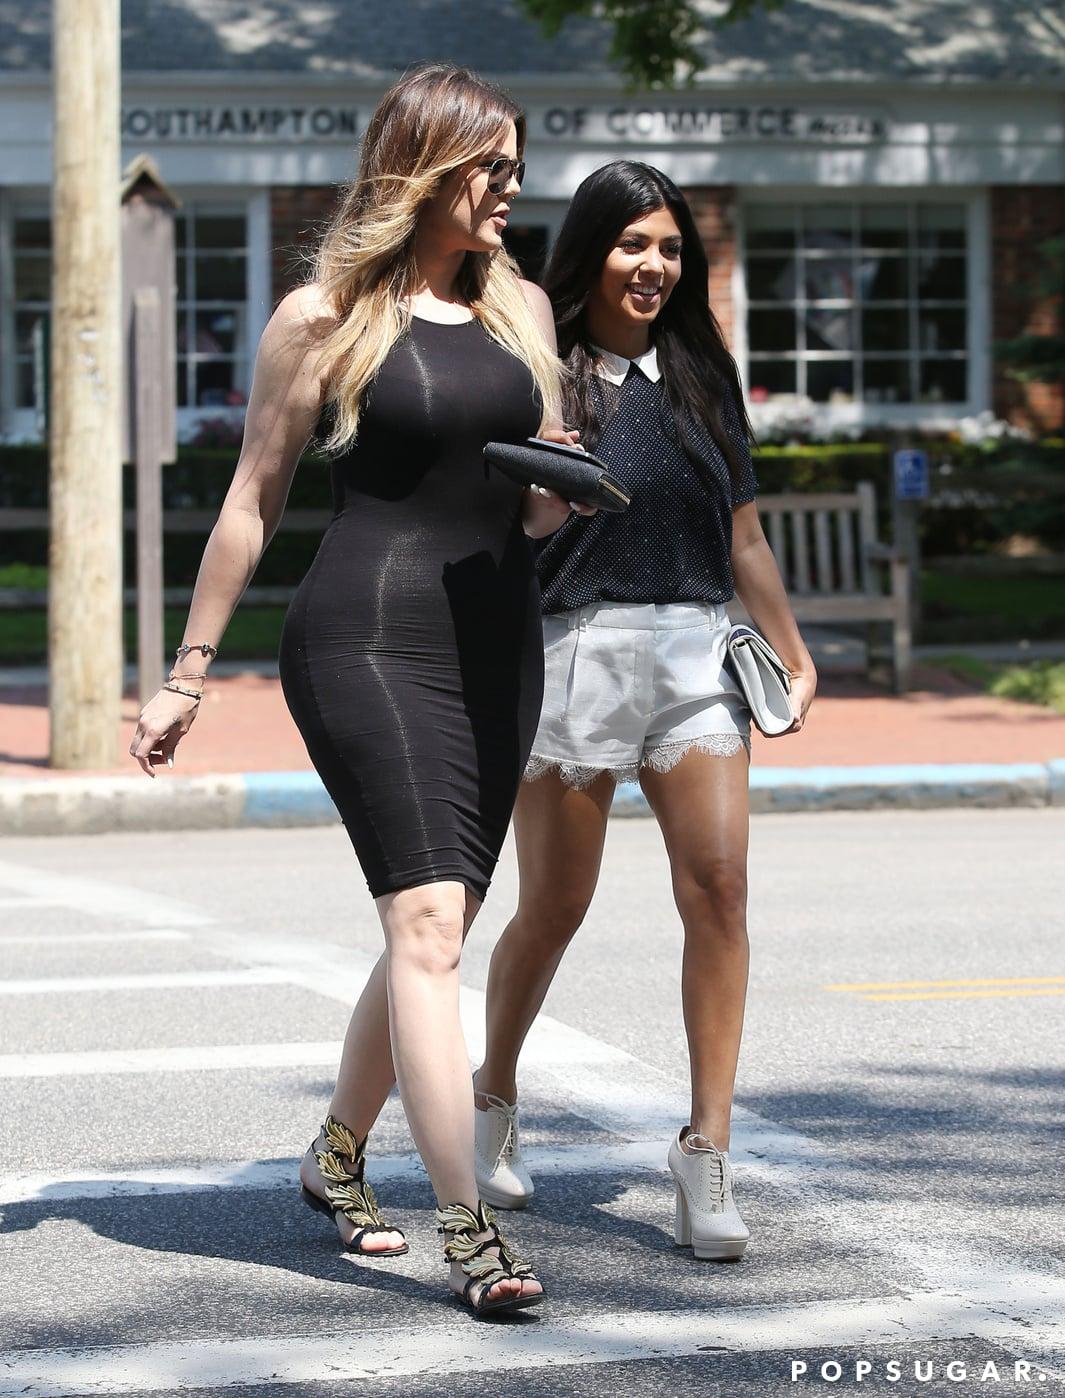 Is This Kourtney Kardashian's Baby Bump?